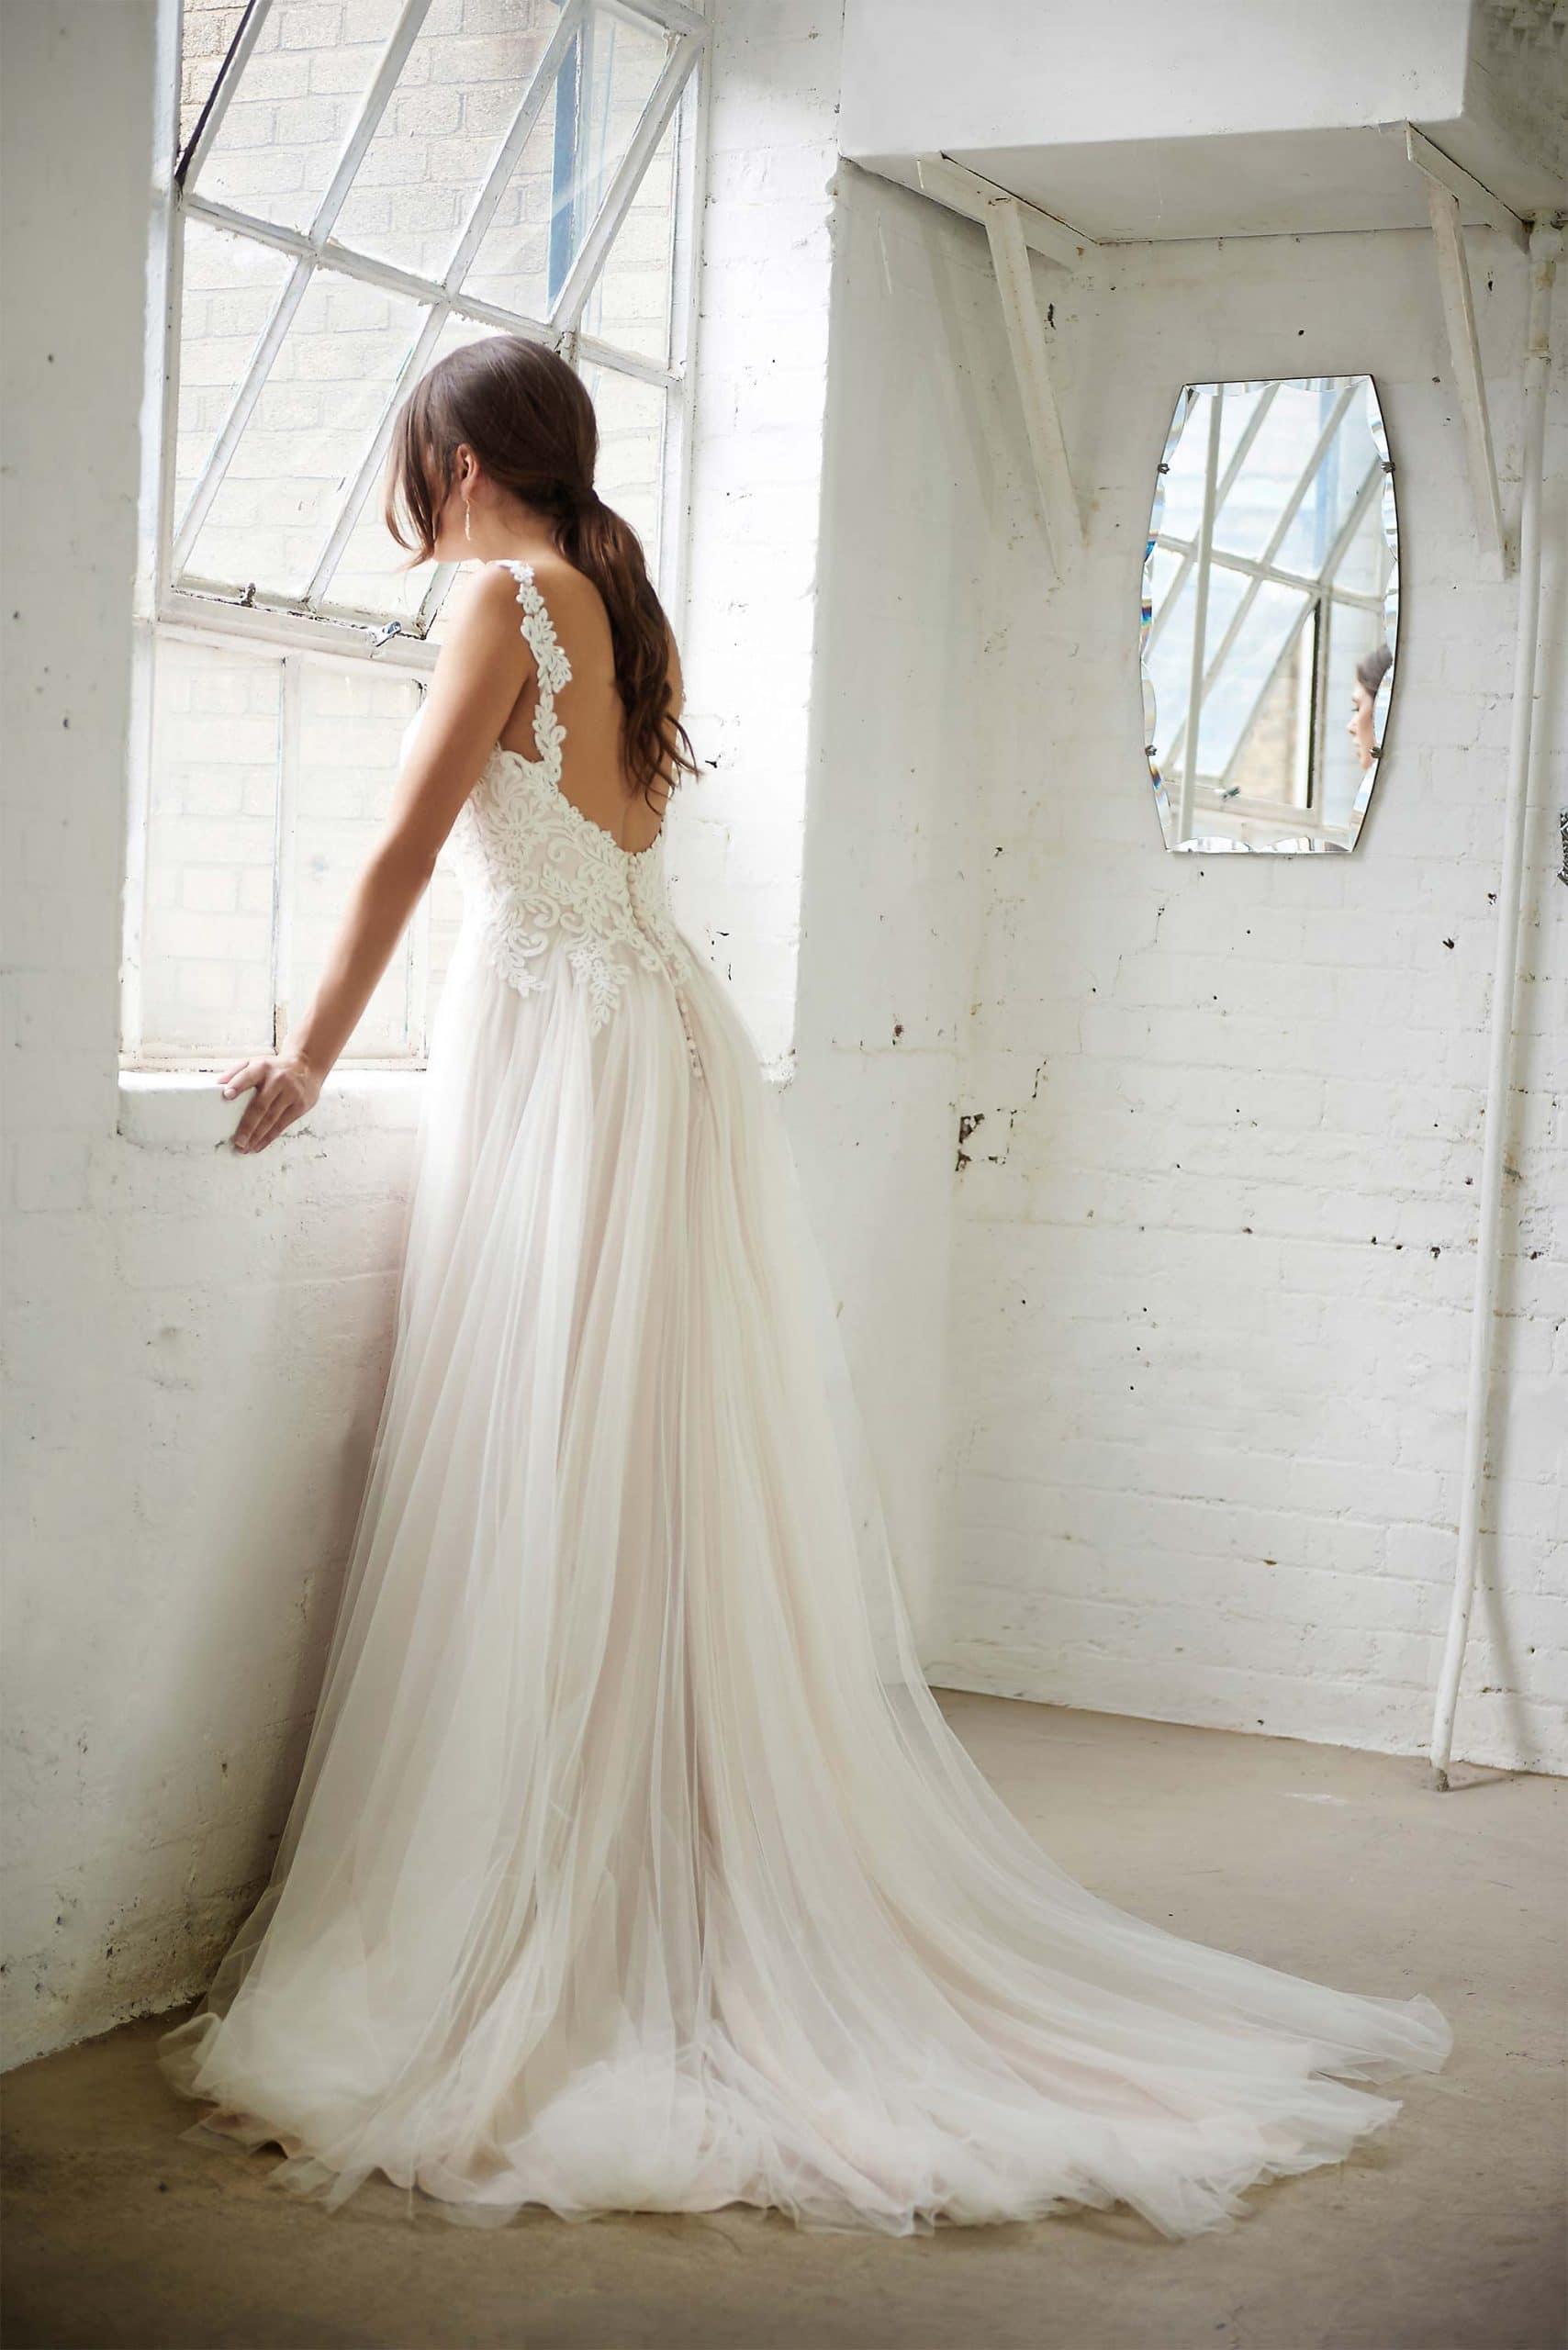 Boho wedding dress sweetheart neckline low back flowty tulle skirt blush skirt Florence 2